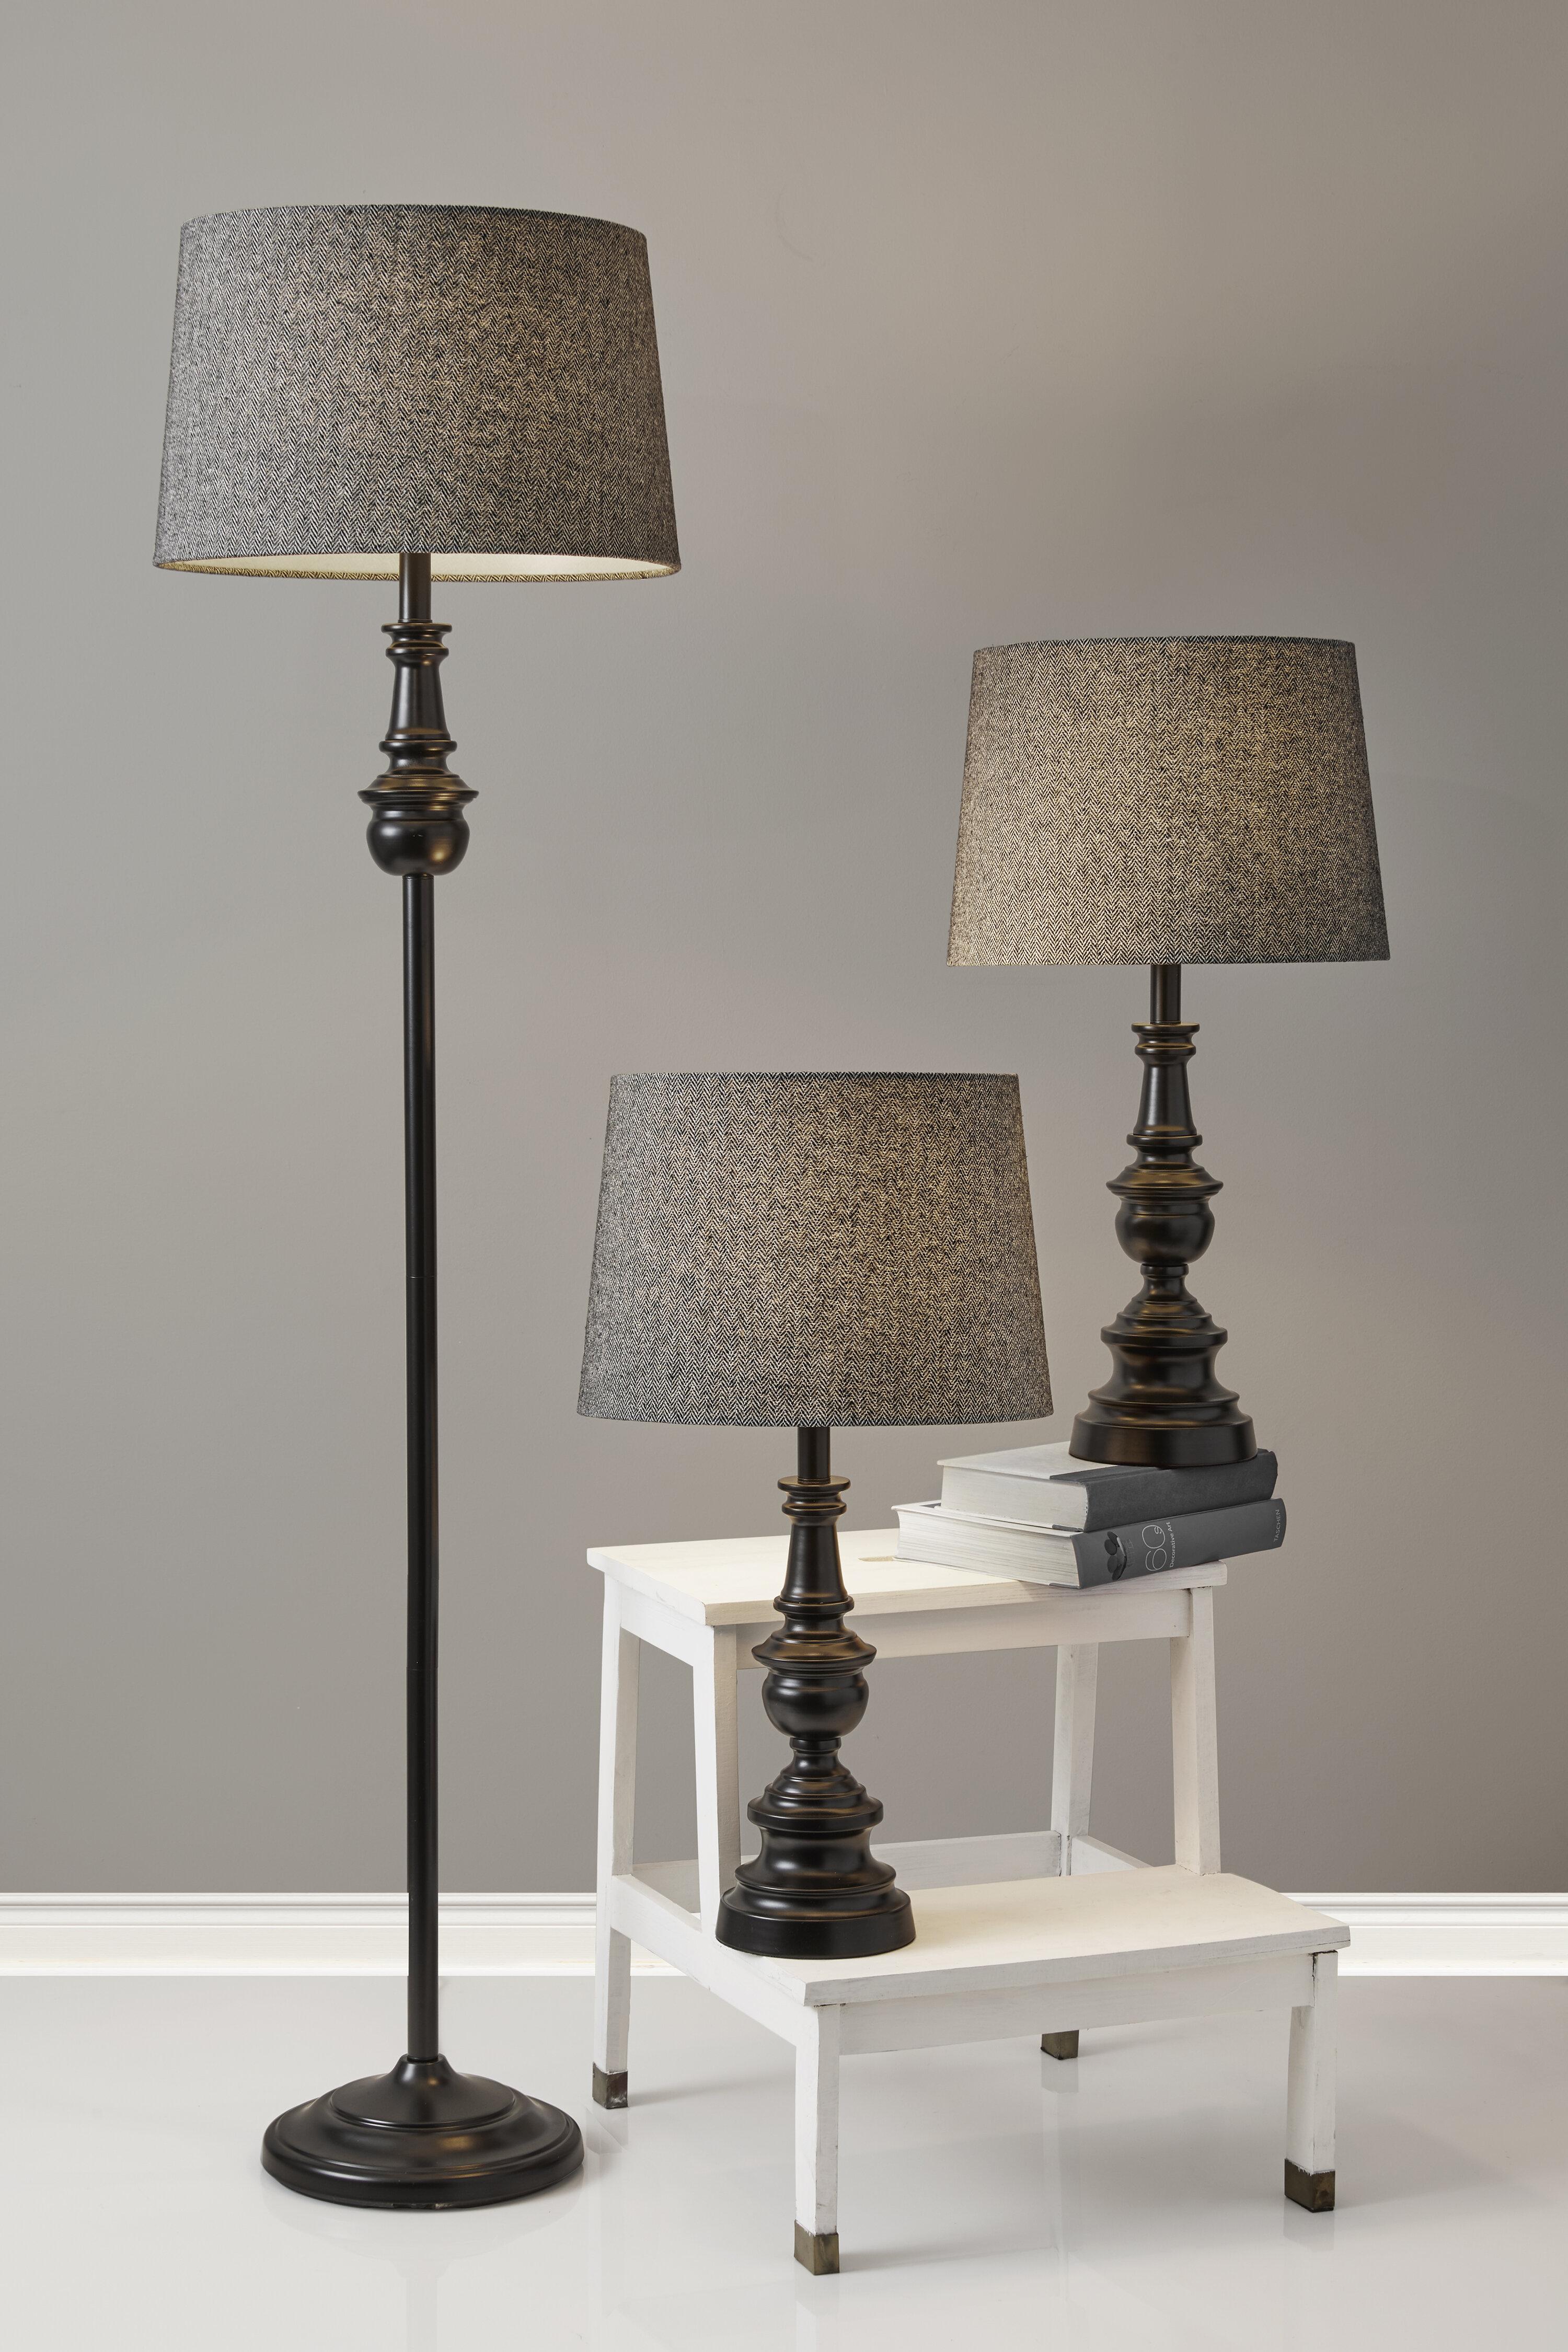 Charlton Home Chiu Black Floor And Table Lamp Set Reviews Wayfair